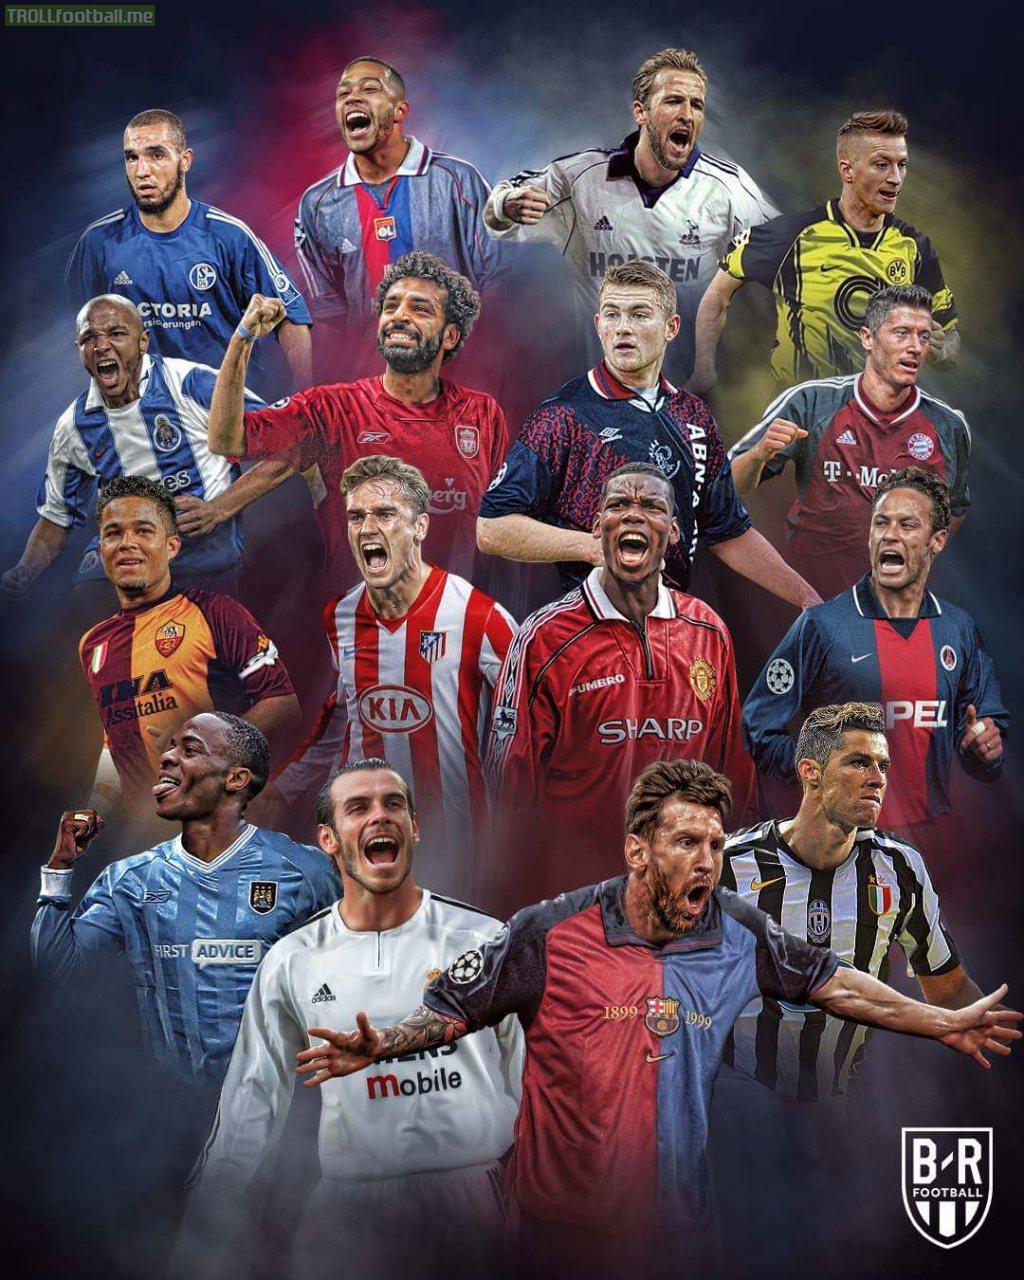 Bleacher Report's classic flavour on the 2018/19 UEFA Champions League knock-out stage participants